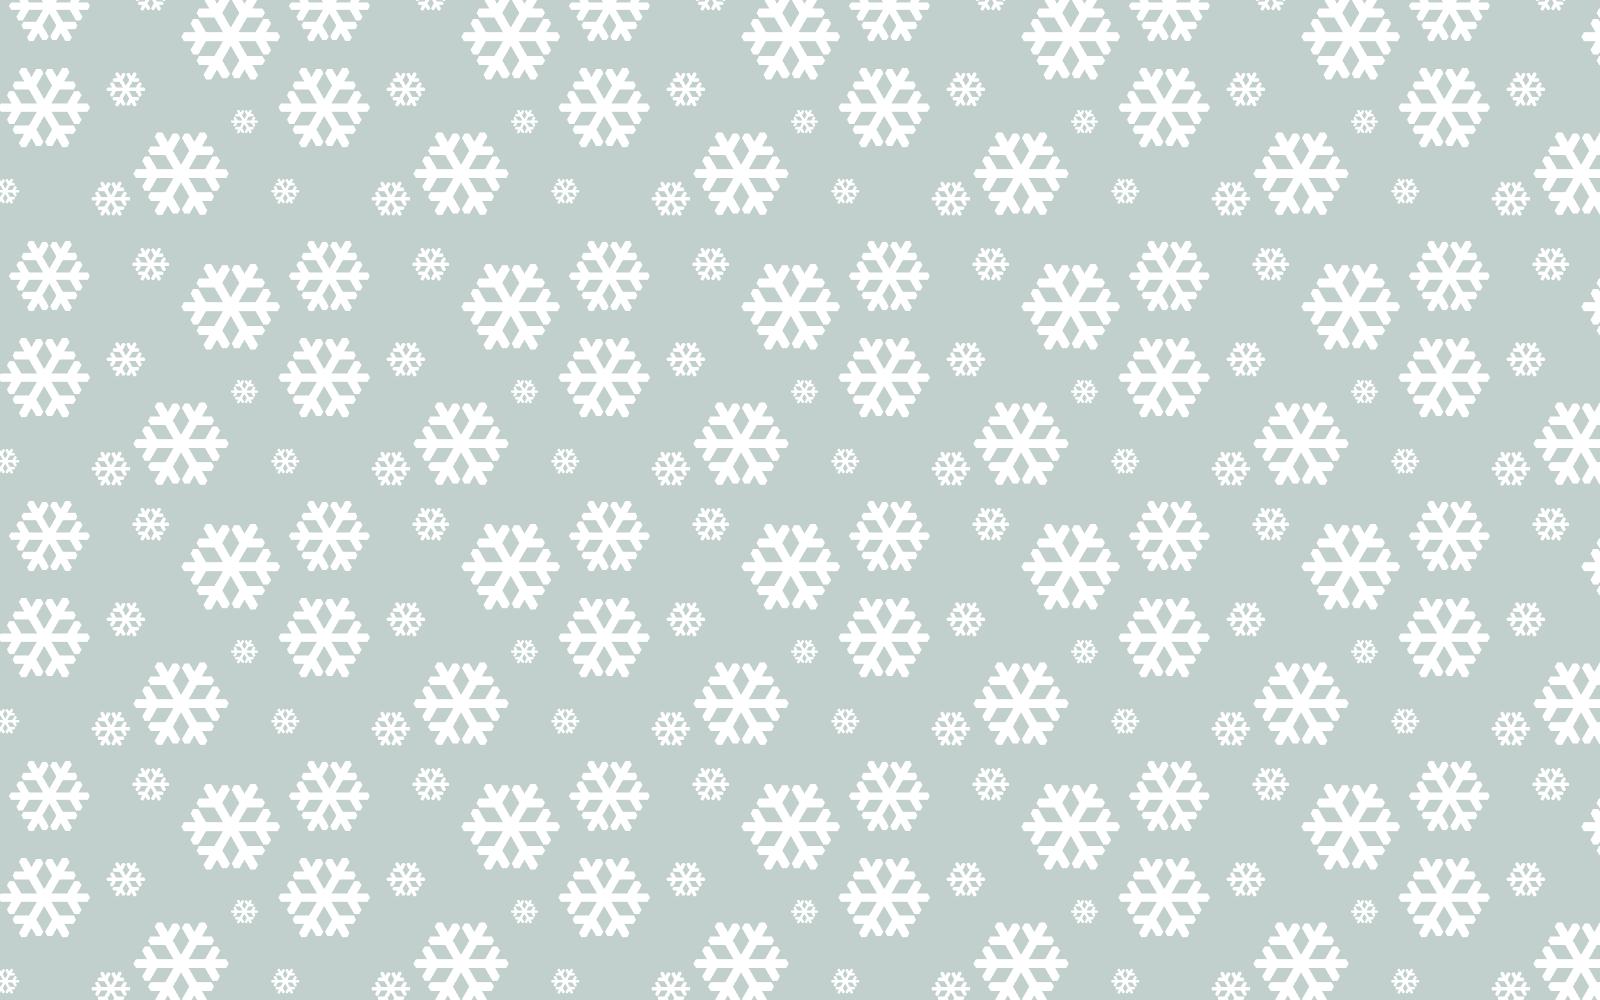 Cute Christmas Backgrounds Tumblr 05 Y2 Yoga